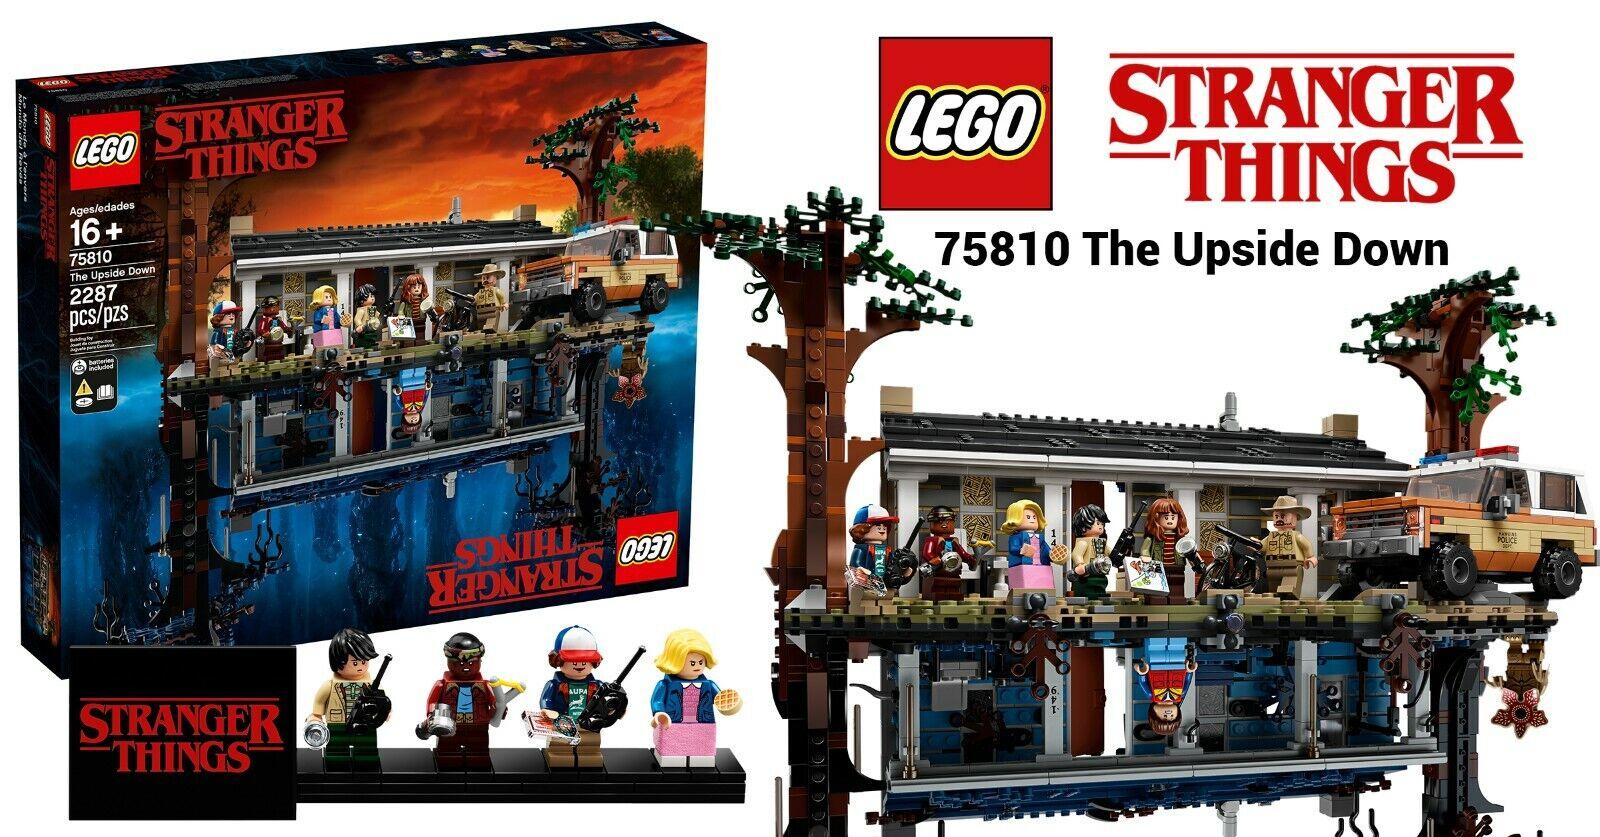 NEW Lego Stranger Things The Upside Down Set 75810 12 8